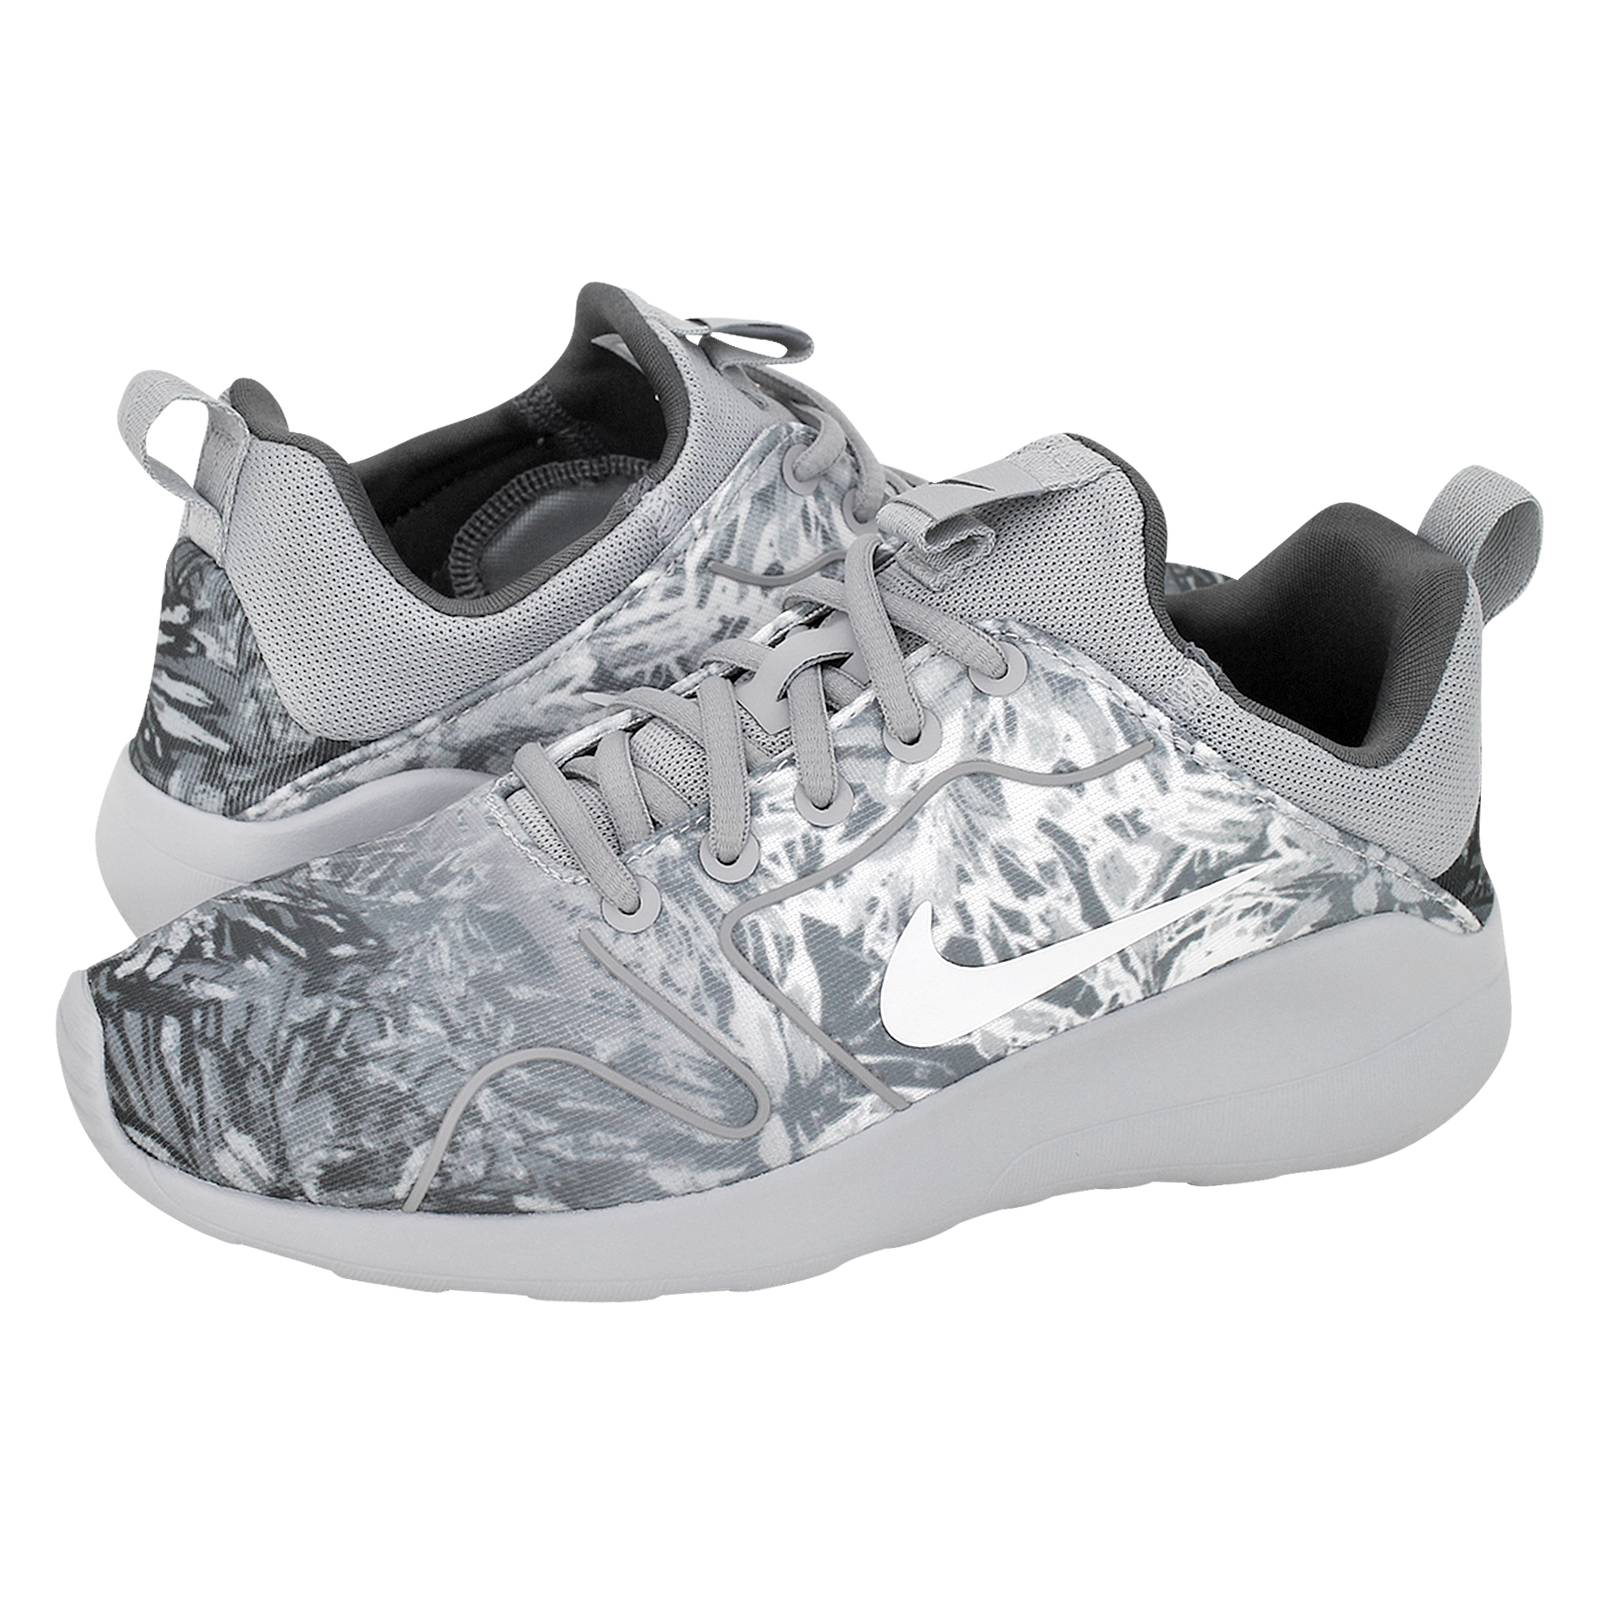 Kaishi 2.0 Print - Γυναικεία αθλητικά παπούτσια Nike από υφασμα ... 6d1cb51c7fd